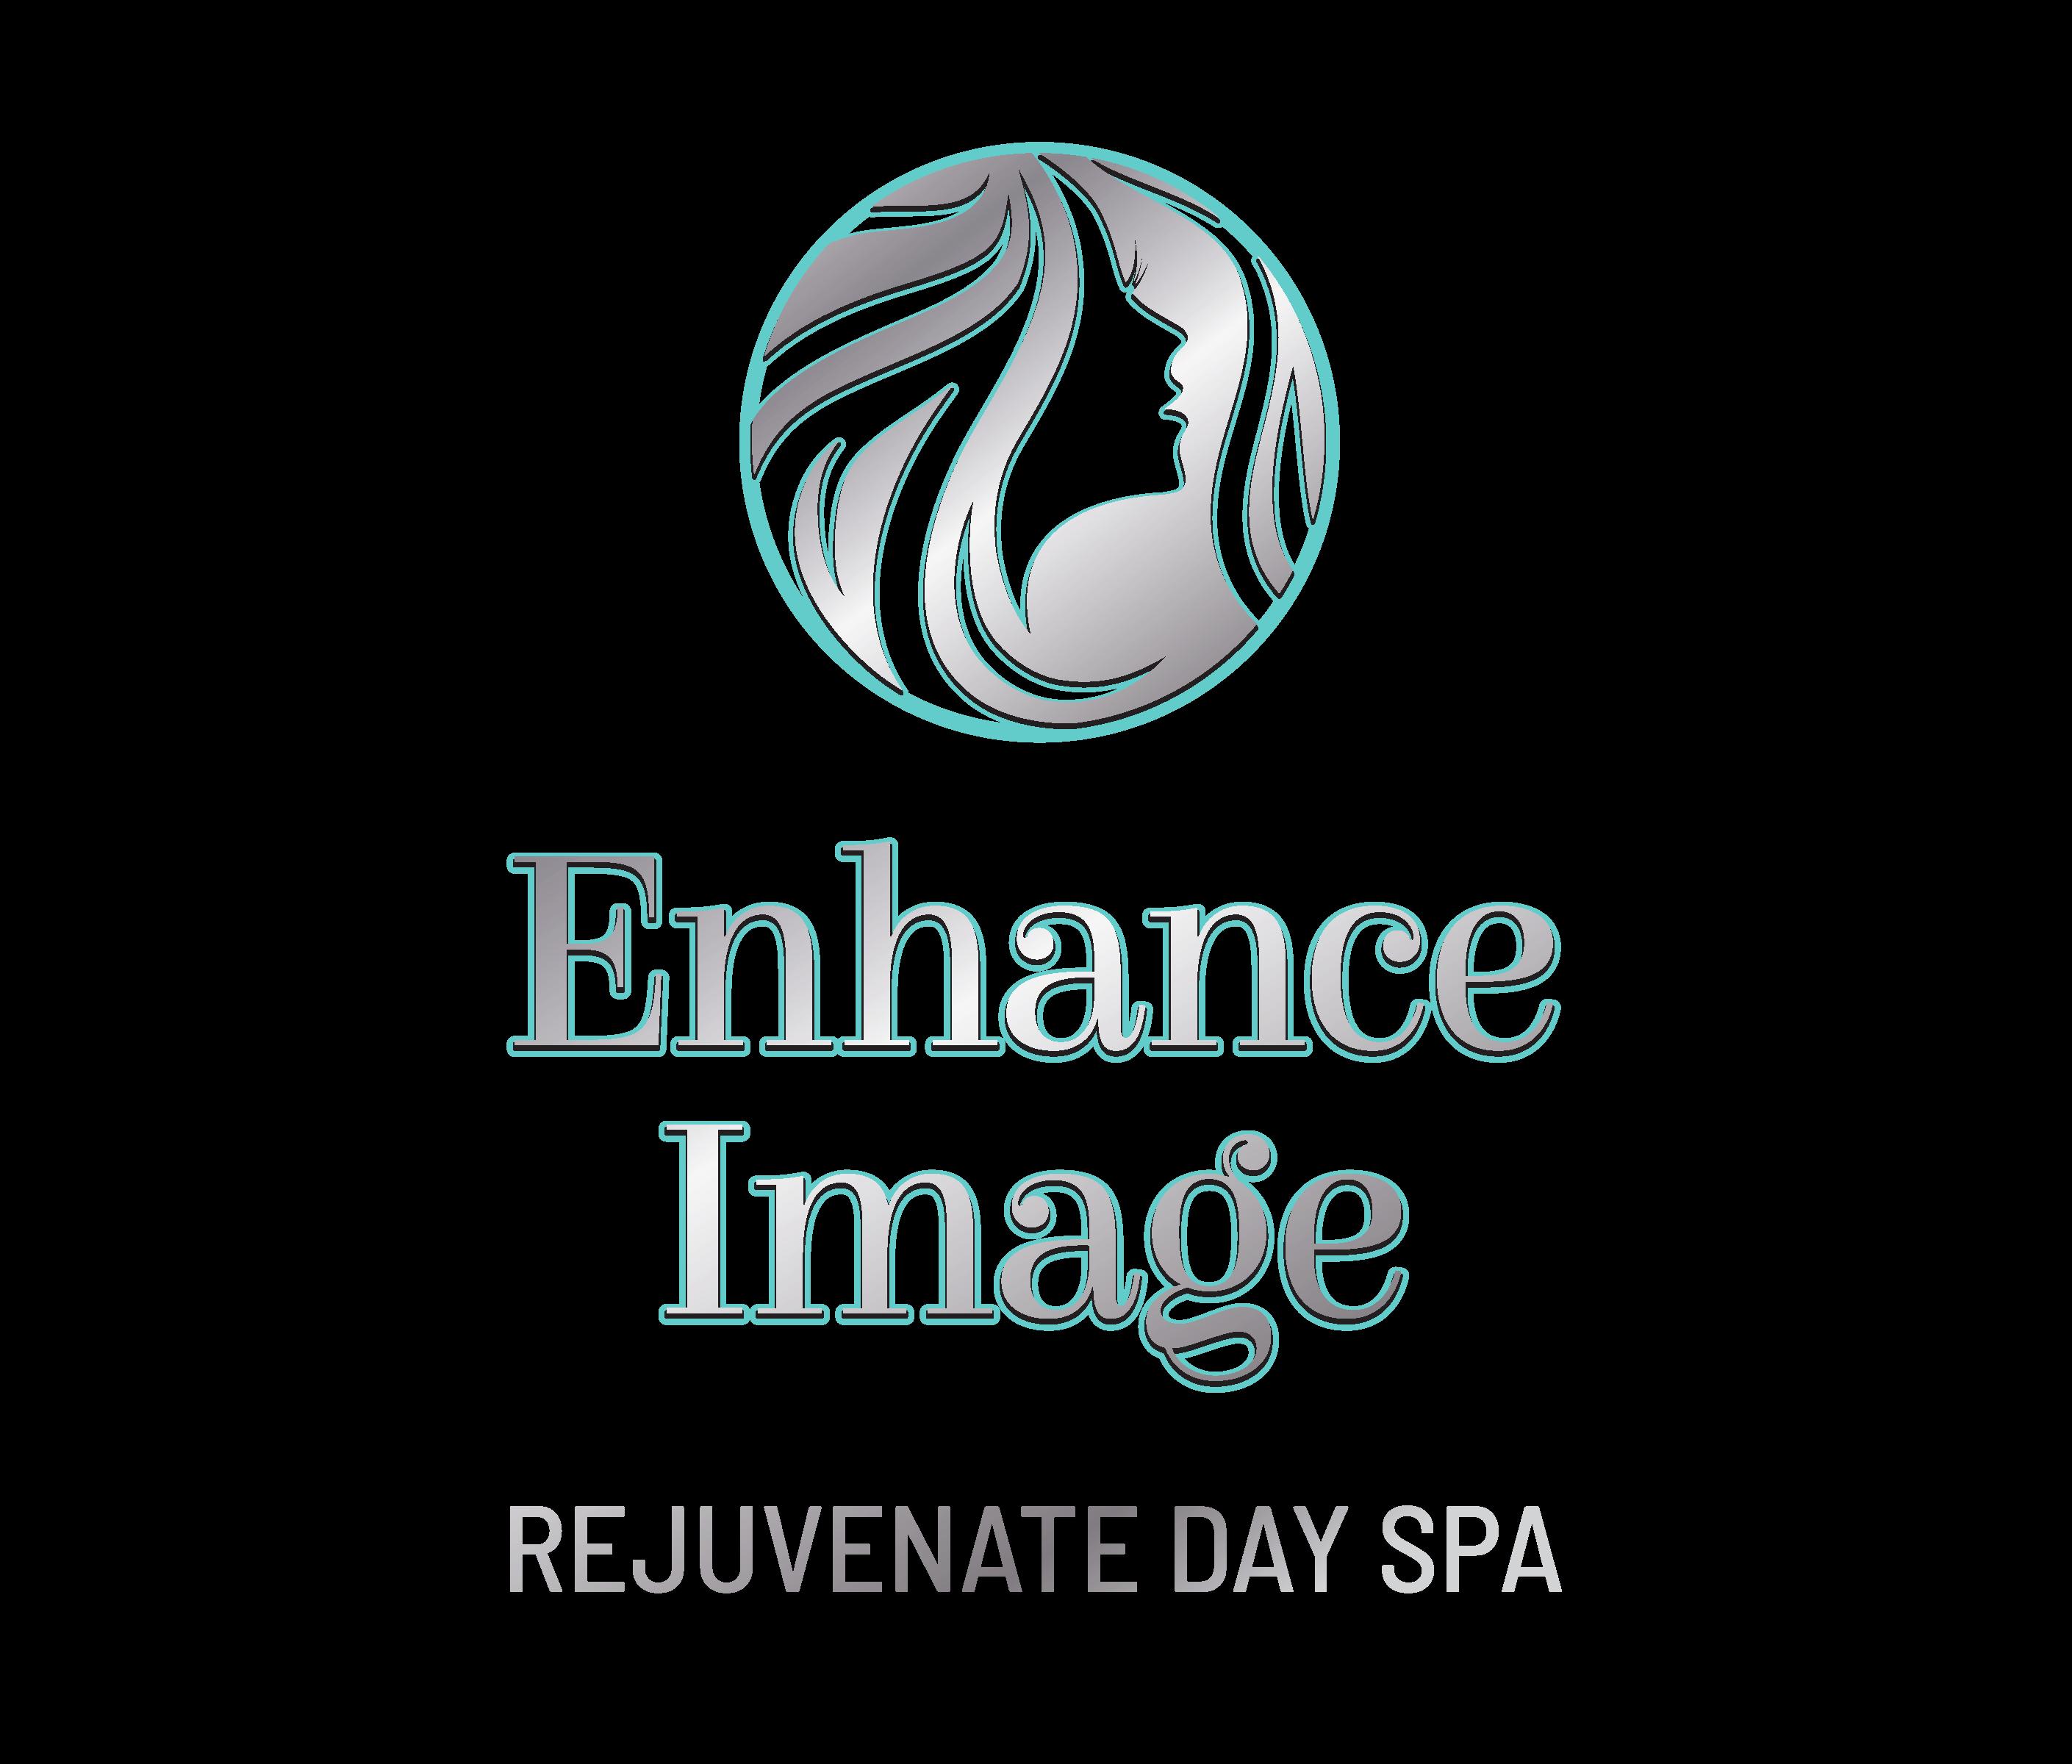 Enhance Image Rejuvenate Day Spa